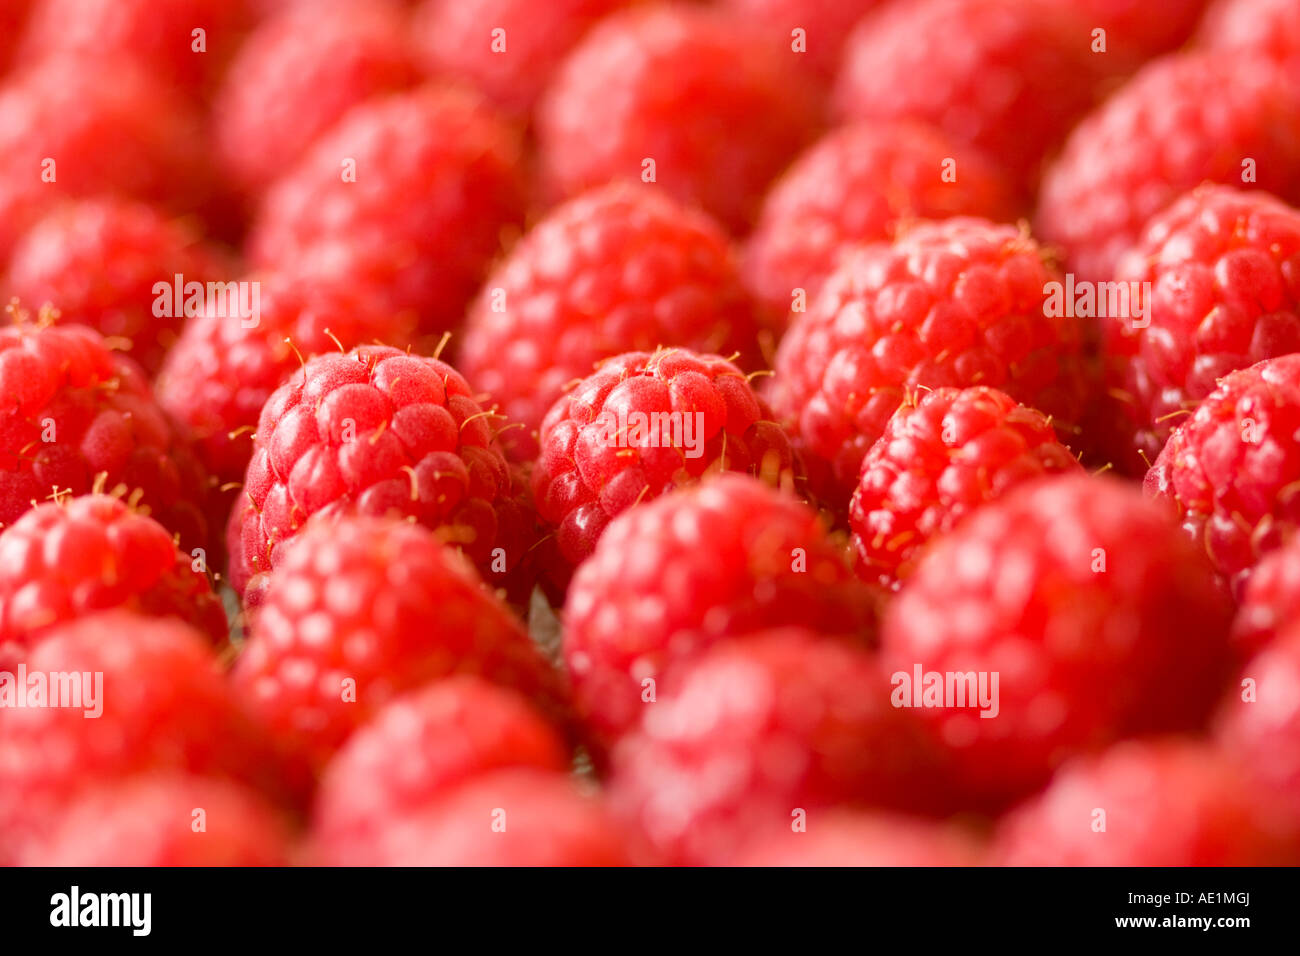 Raspeberries displayed for sale - Stock Image